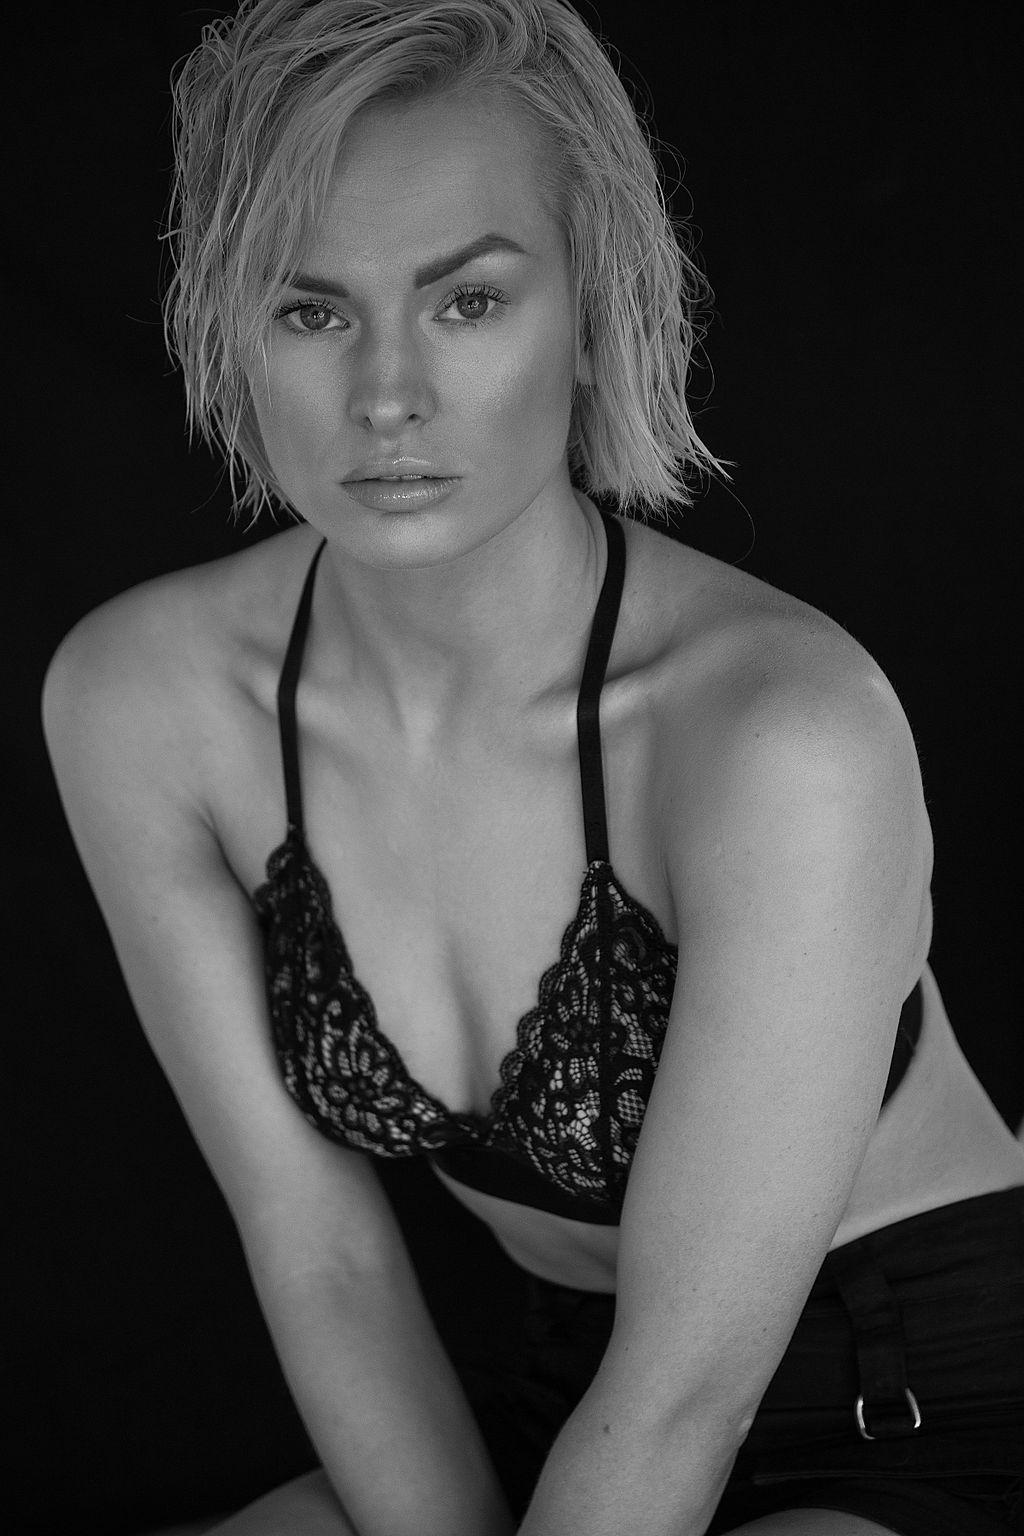 Black and white intimate portrait